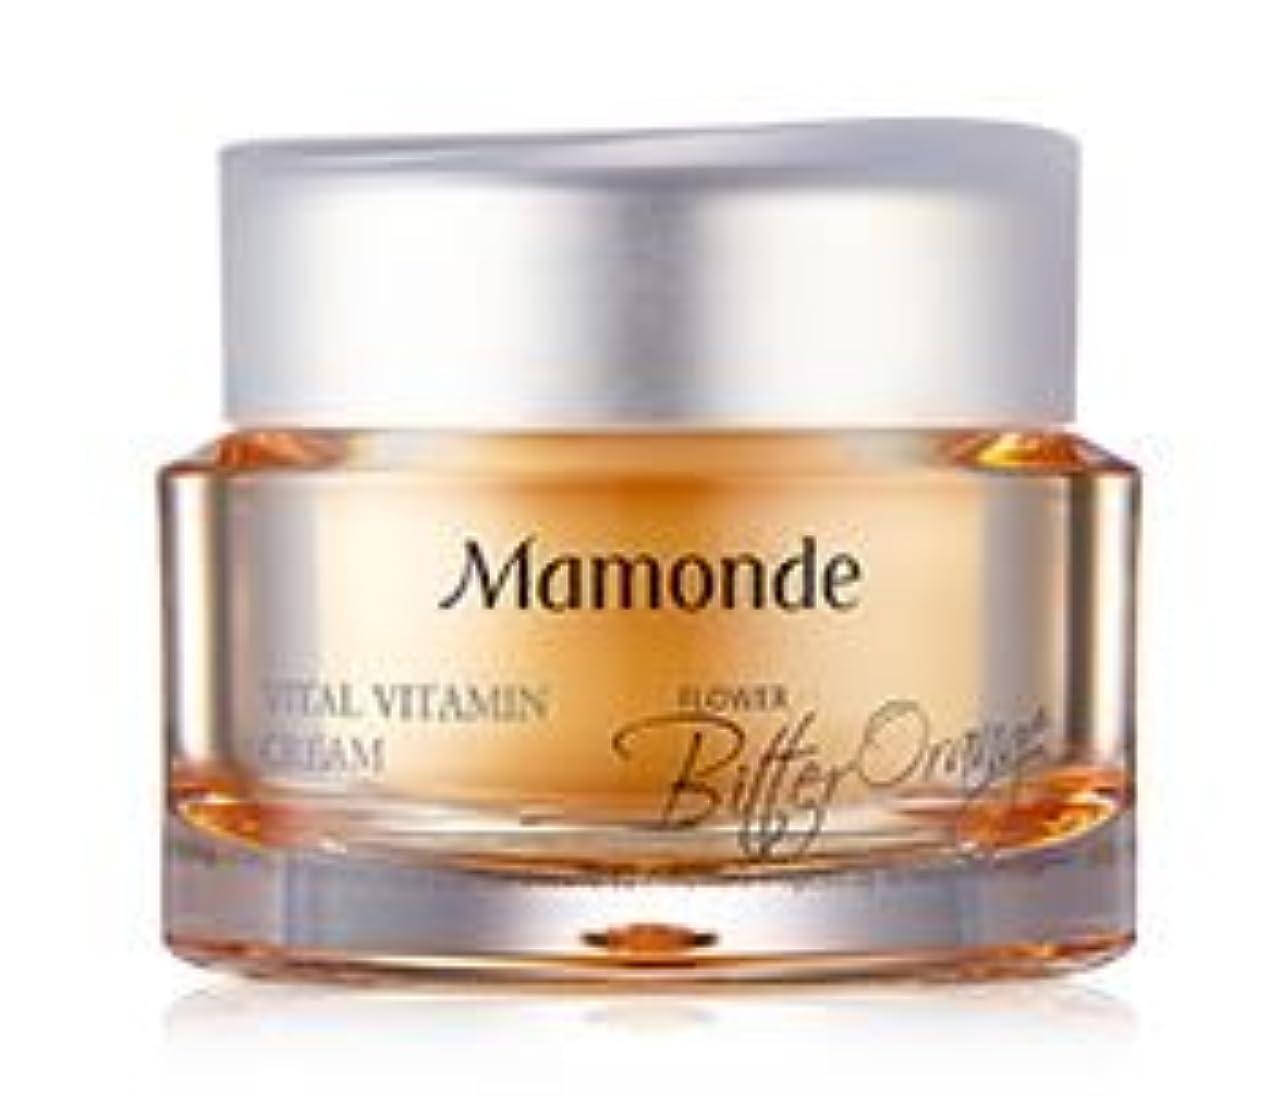 [Mamonde] Vital Vitamin Cream 50ml /[マモンド]バイタルビタミンクリーム50ml [並行輸入品]